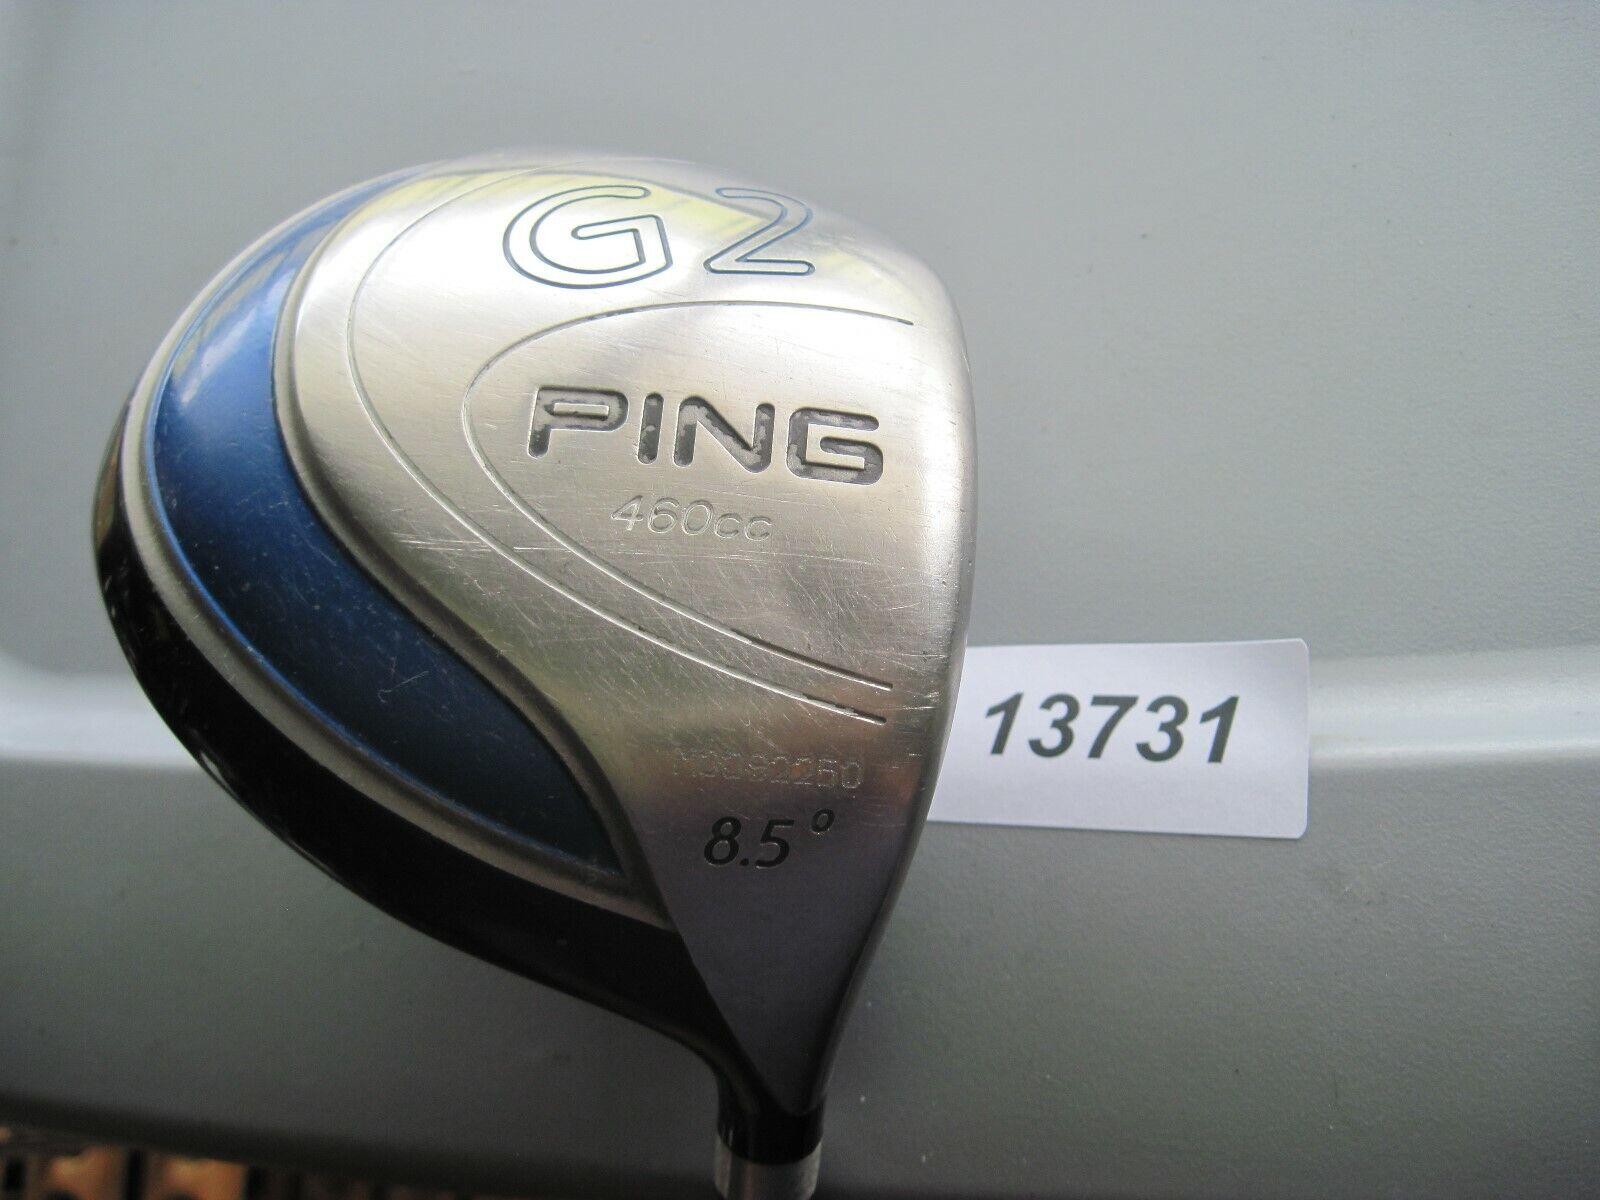 Ping 460cc  G2  -  8.5° Driver  Aldila NV 65 Stiff Flex Graphite